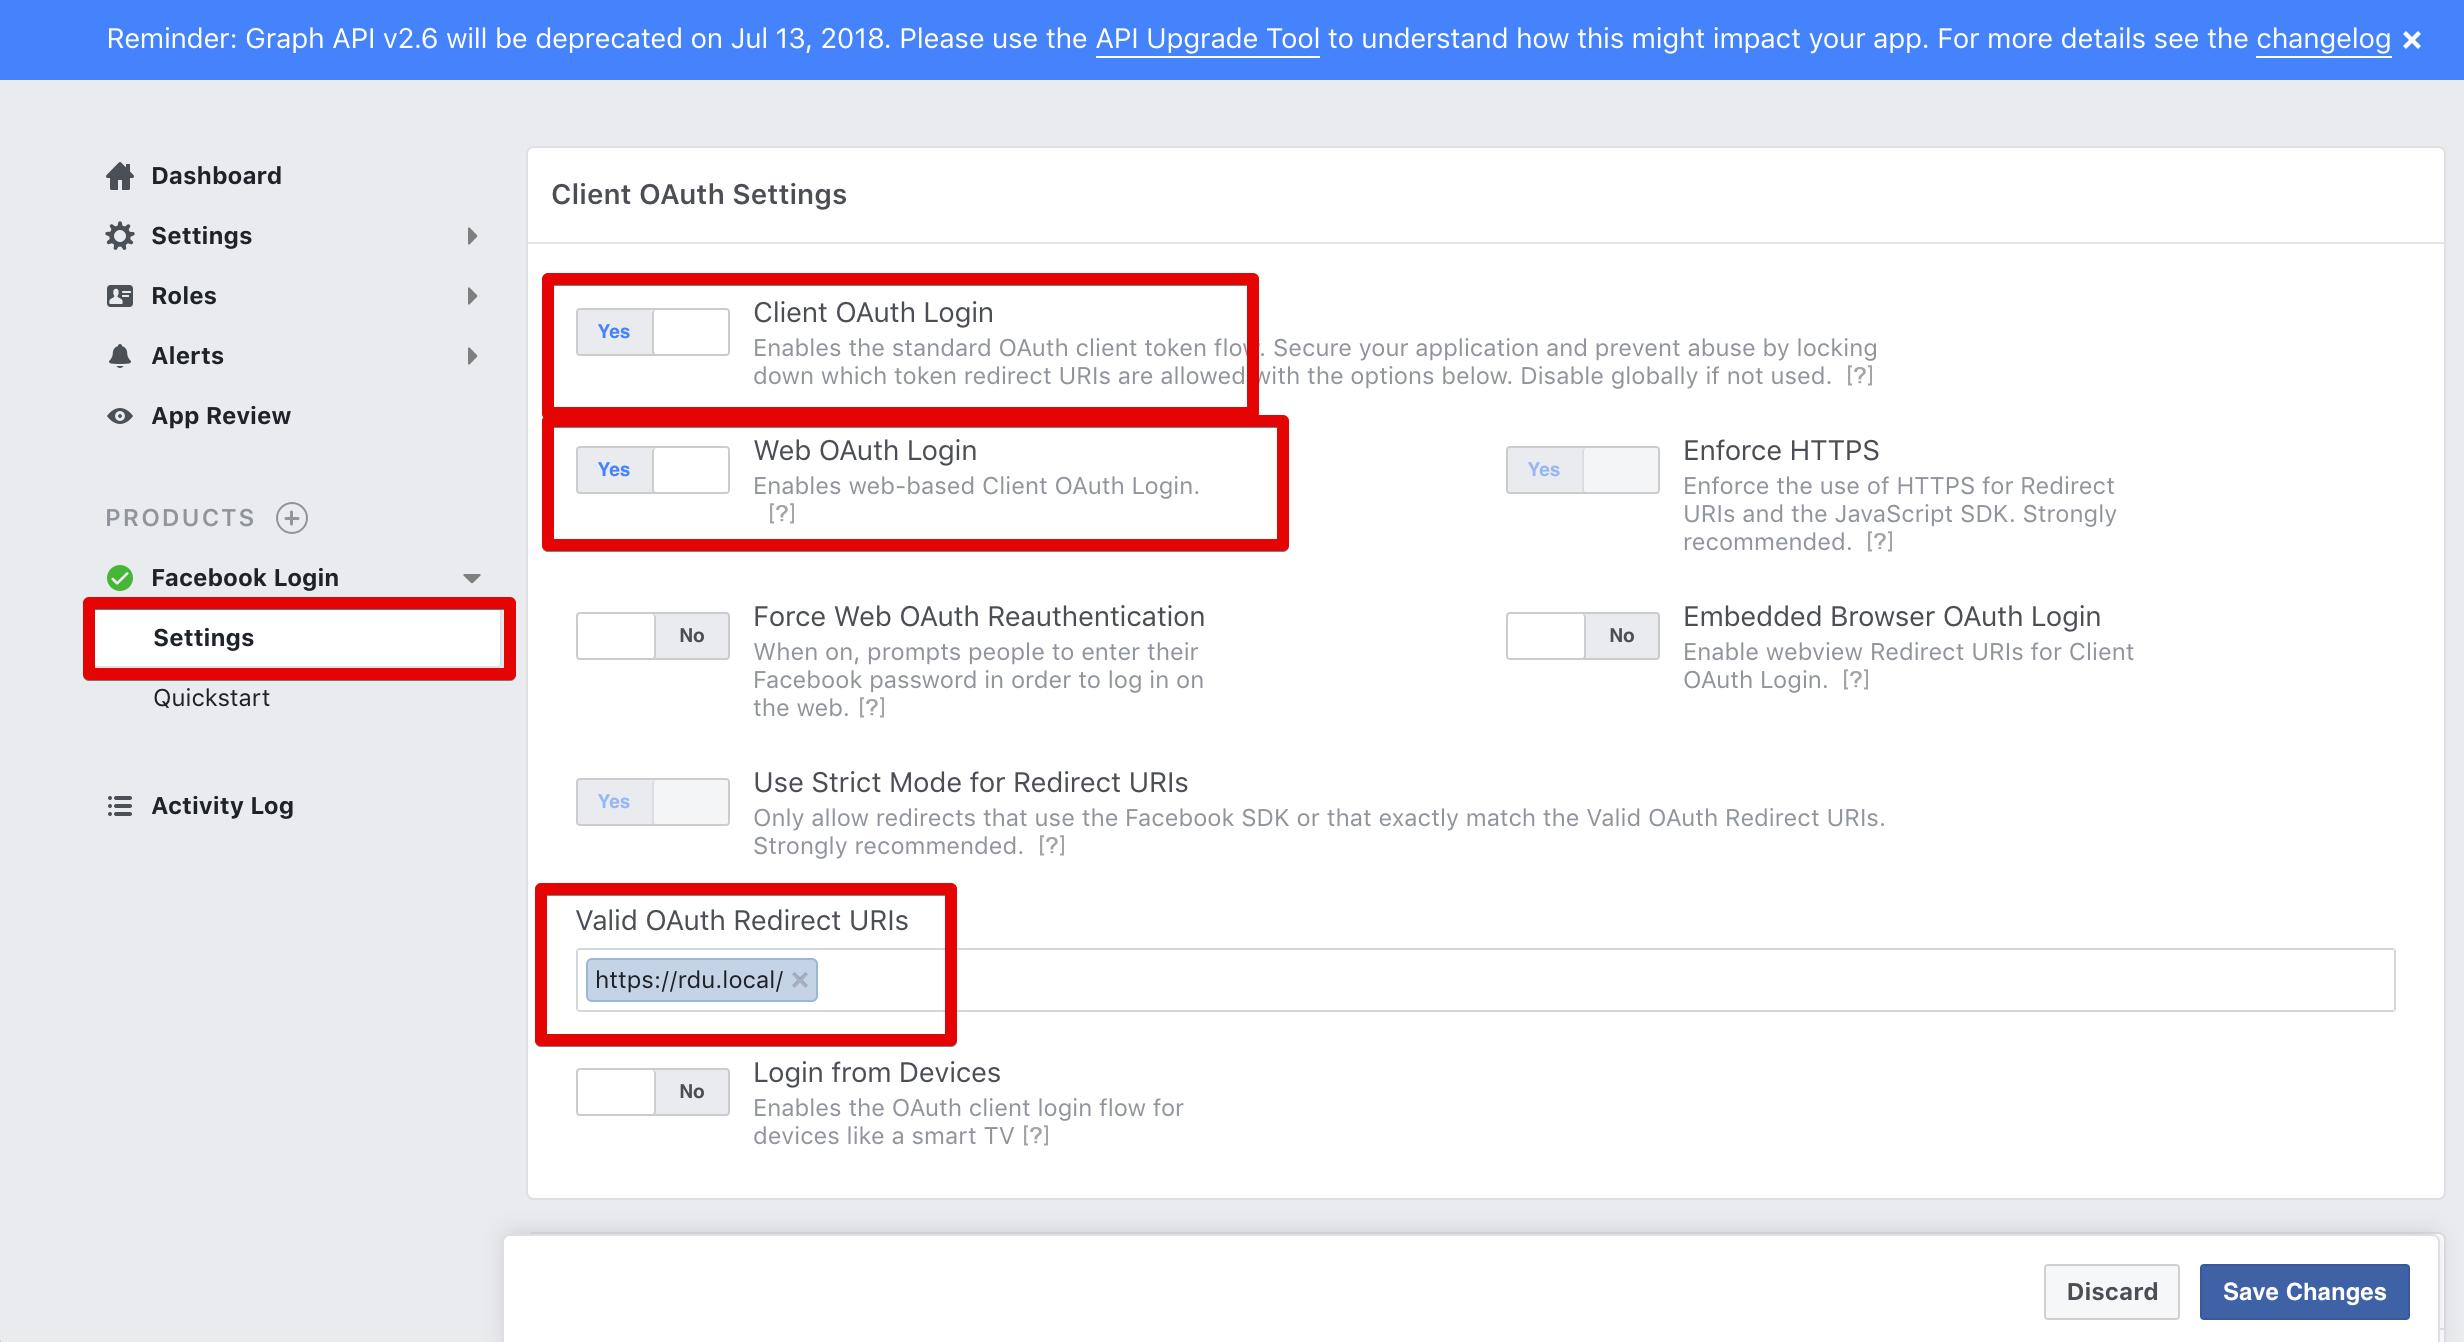 Mobile facebook login not working - SeventhQueen Support